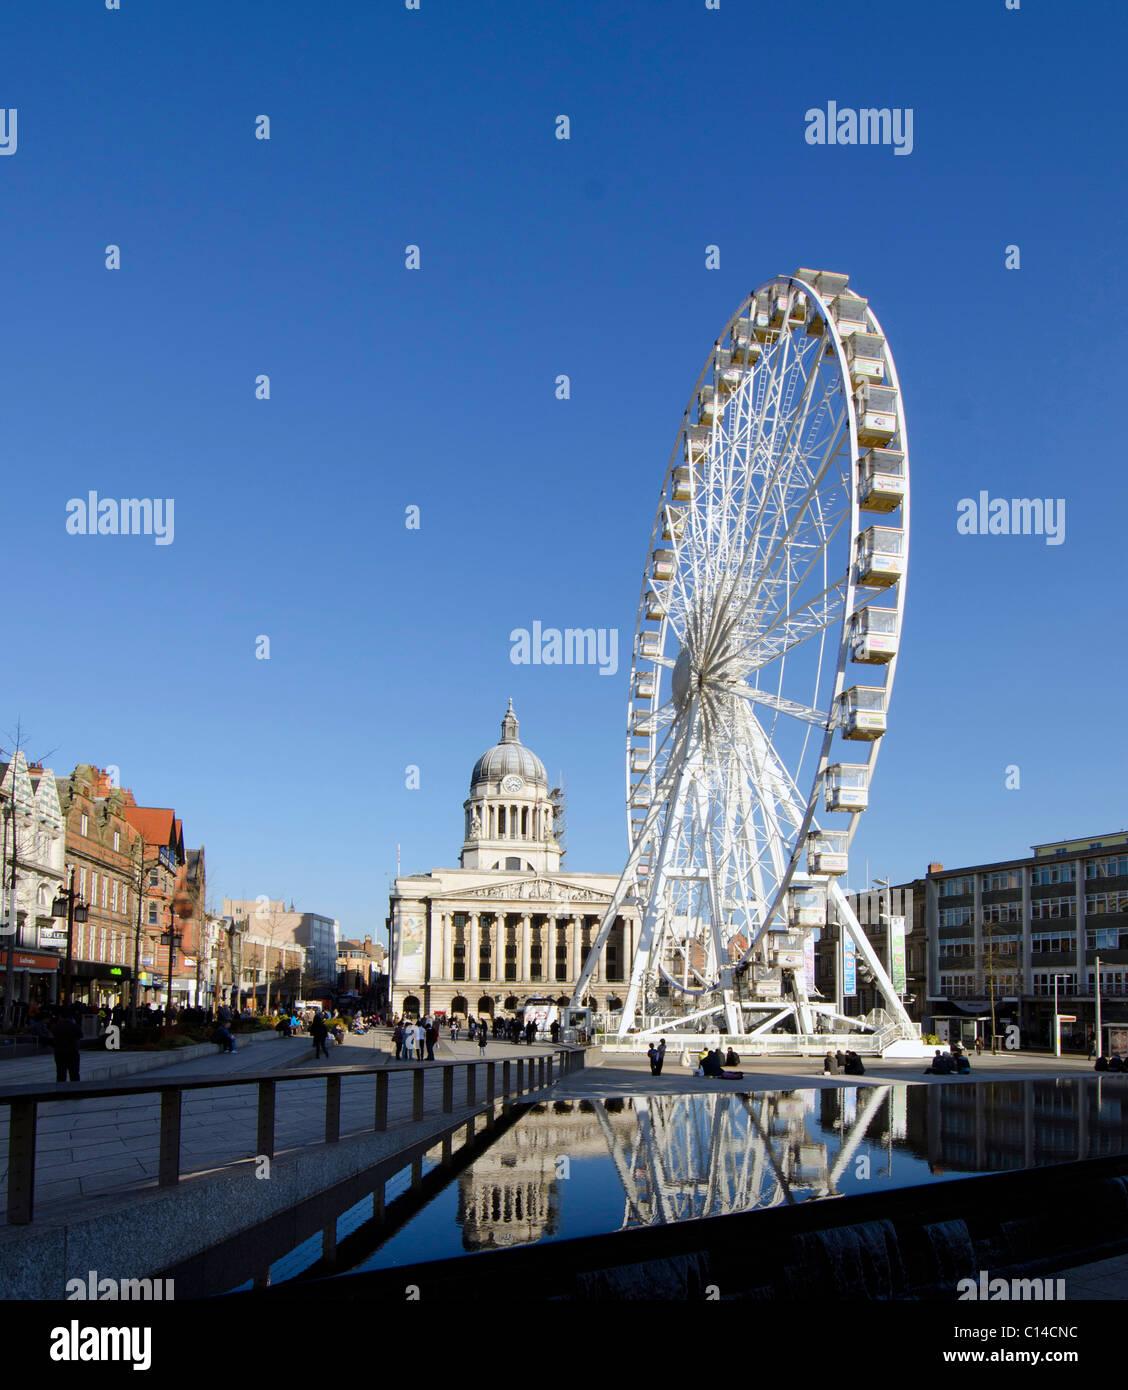 Ferris Wheel in the Old Market Square, Nottingham, England, UK - Stock Image